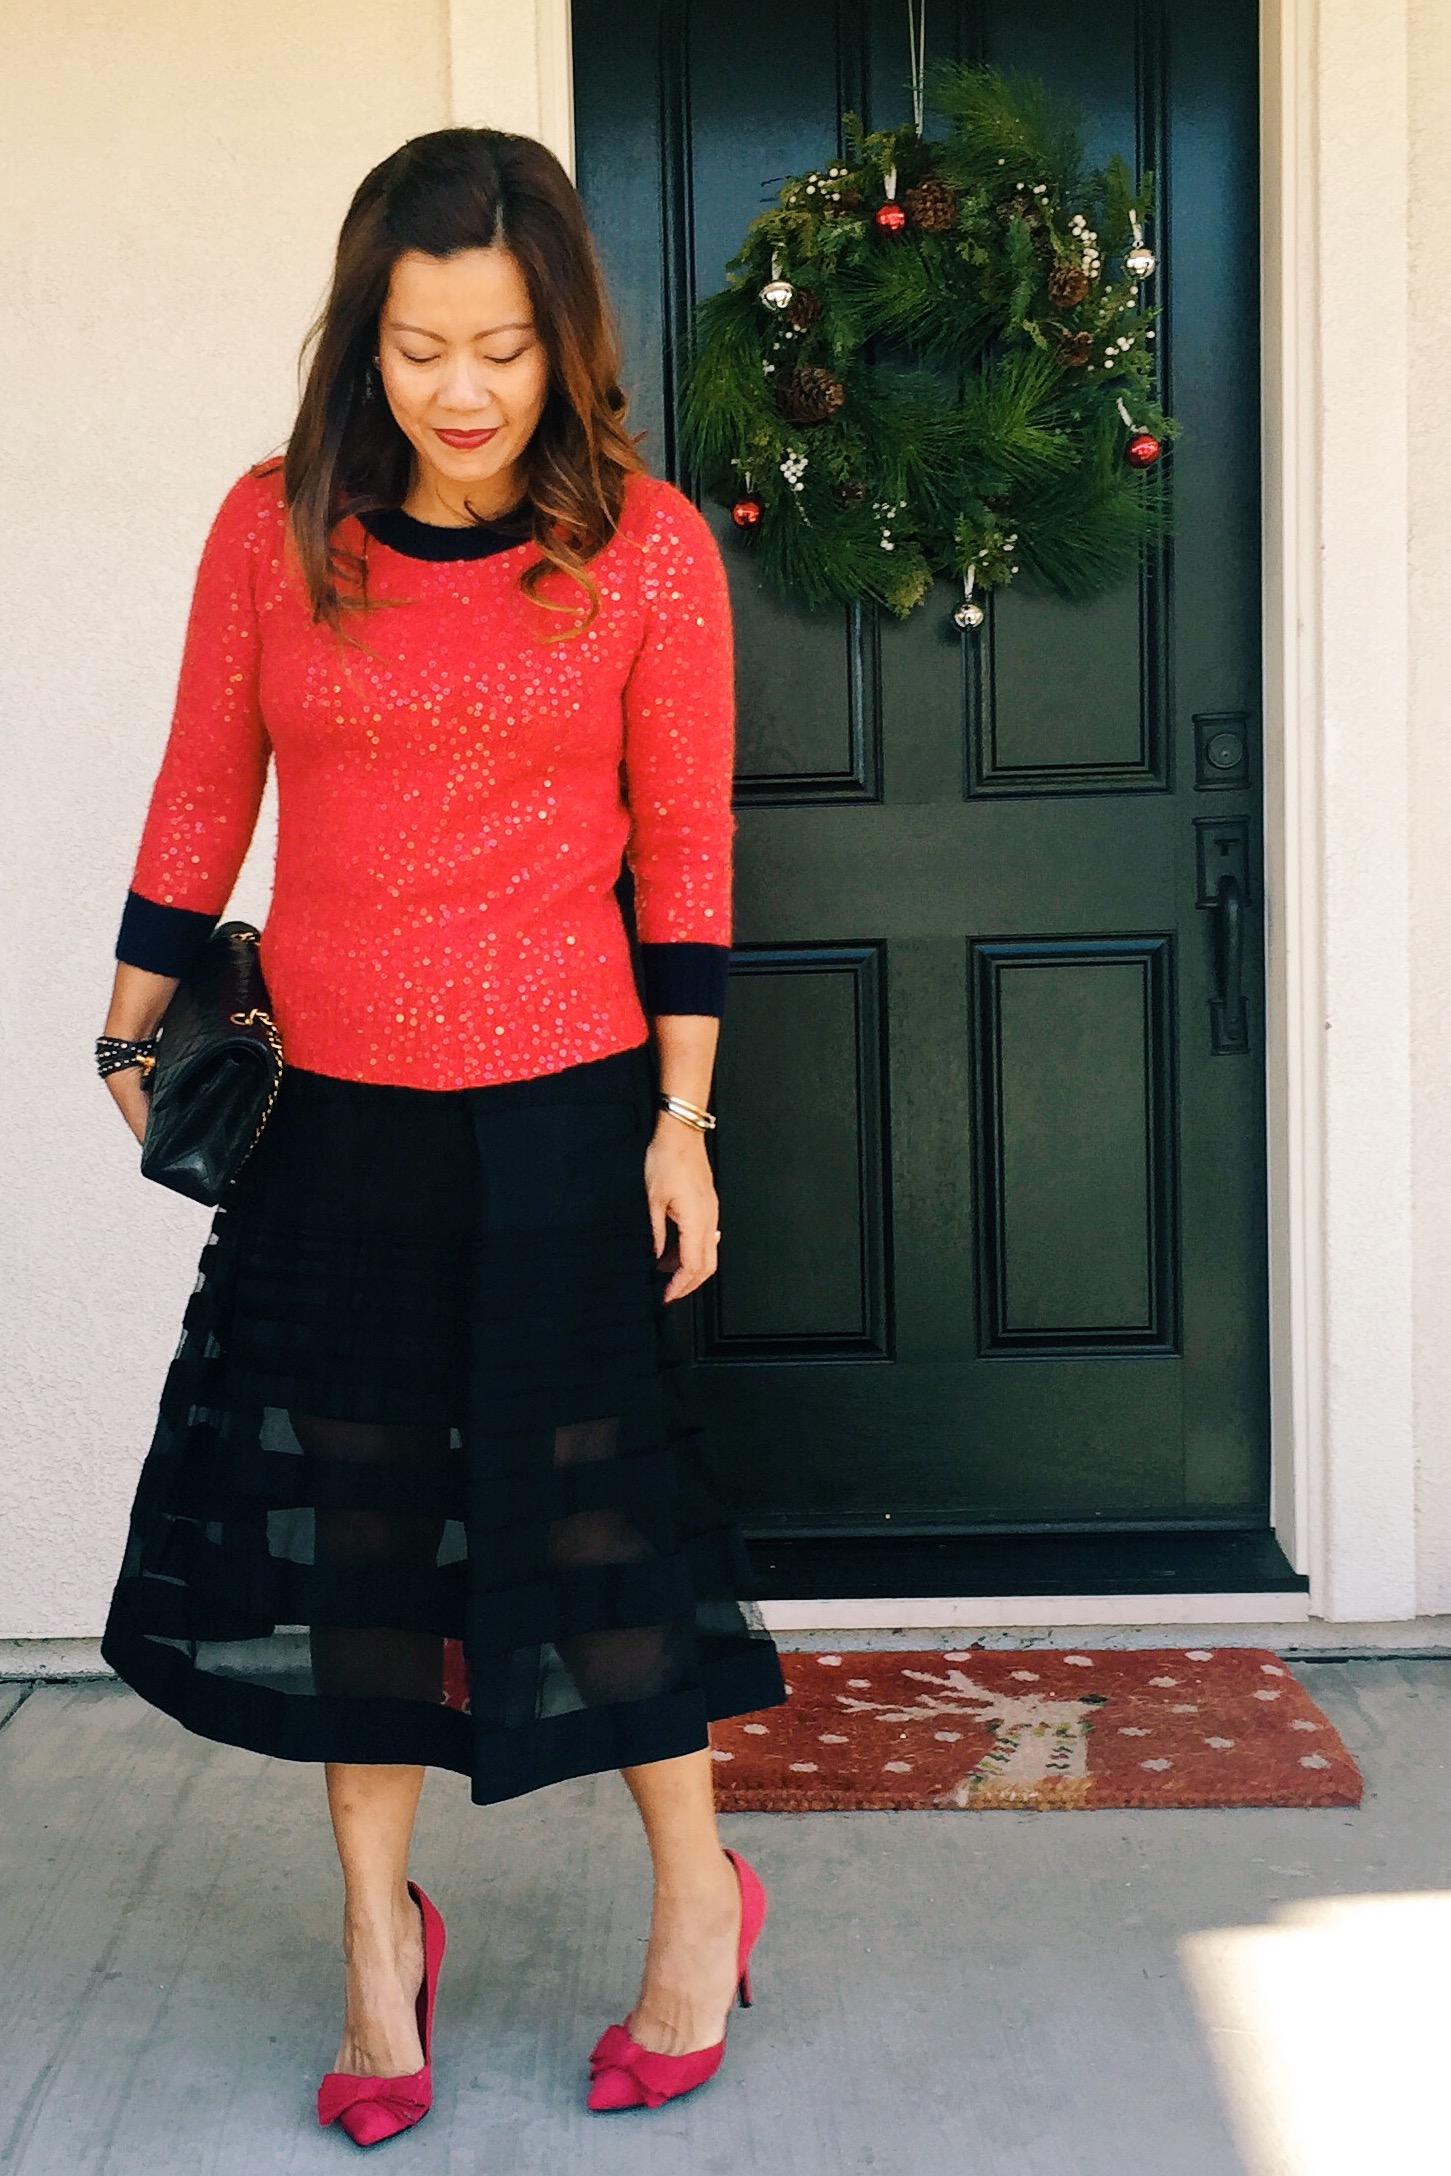 Holiday dressing. J. Crew sweater (old) / Tibi skirt (old) / J ustfab  pumps (old)